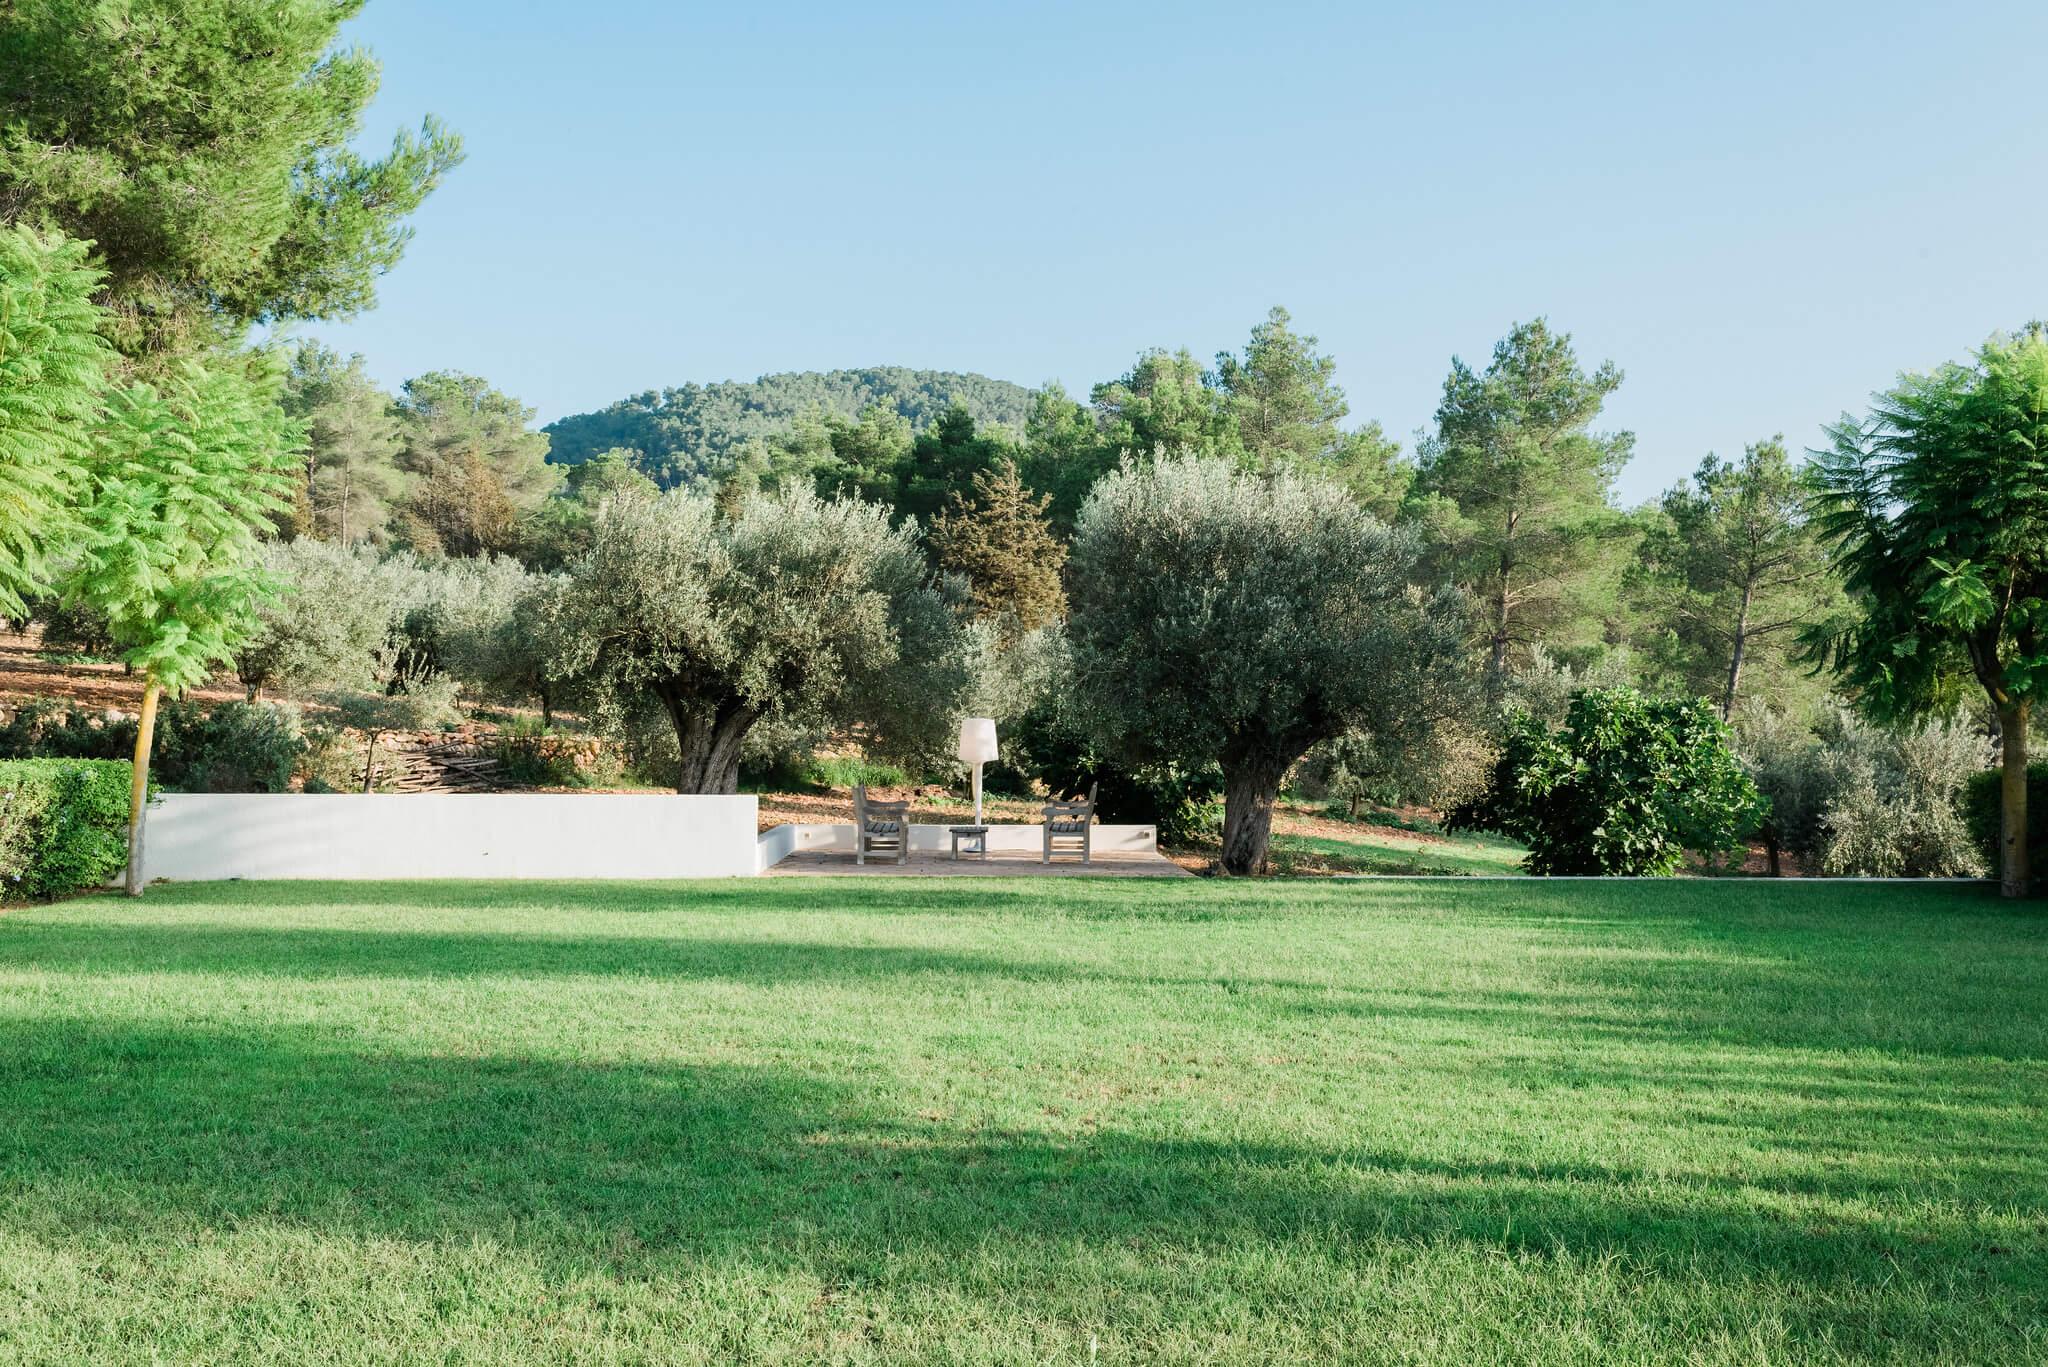 https://www.white-ibiza.com/wp-content/uploads/2020/05/white-ibiza-villas-can-terra-lawn.jpg